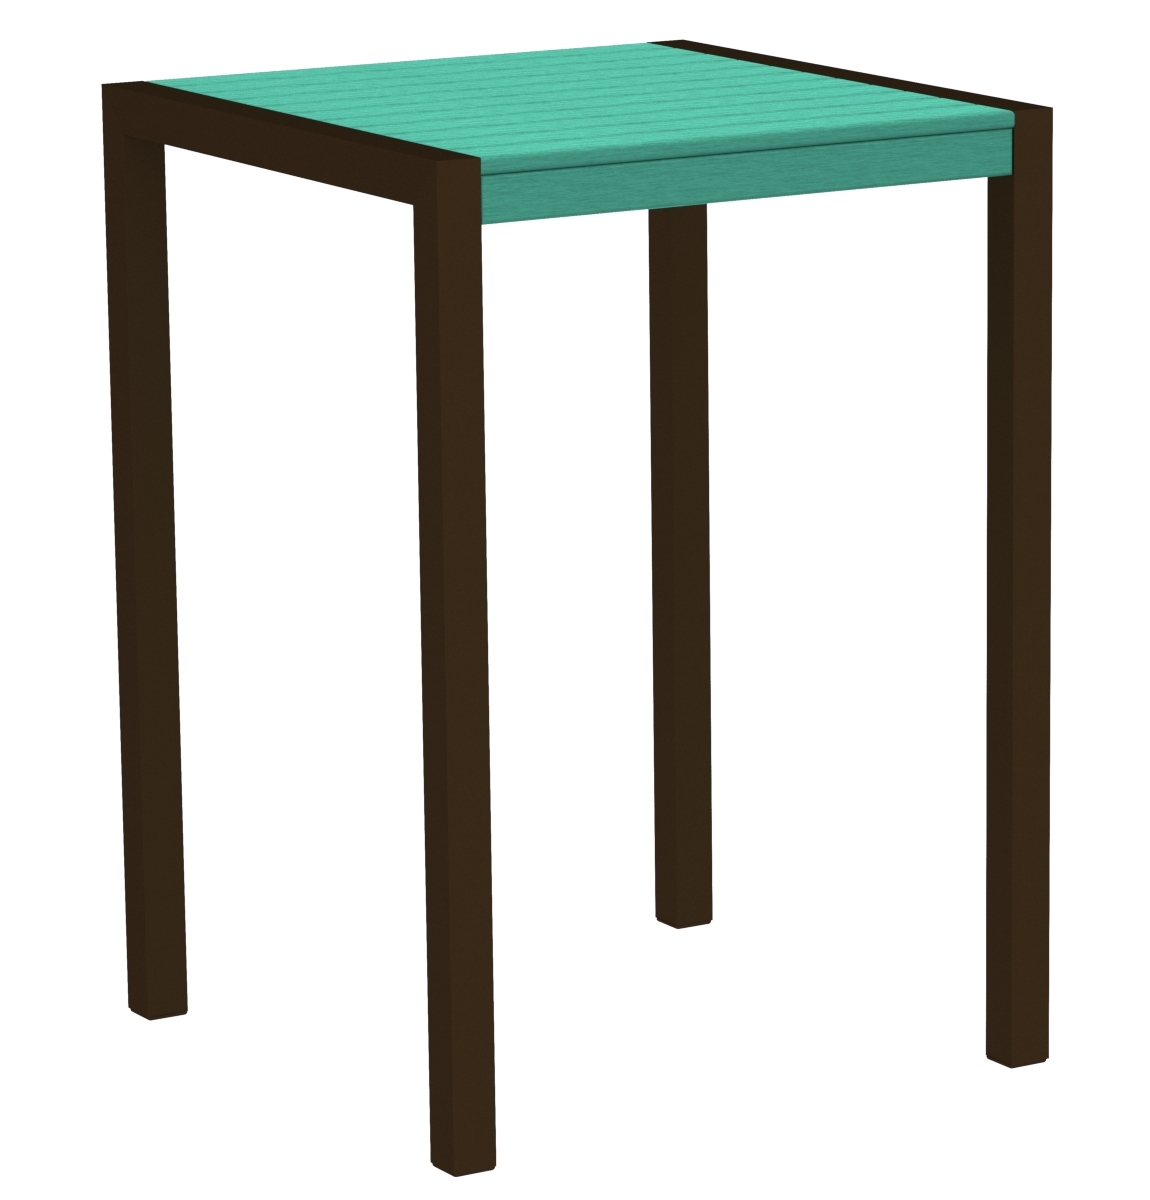 POLYWOOD 8002-16AR MOD 30' Bar Table in Textured Bronze / Aruba